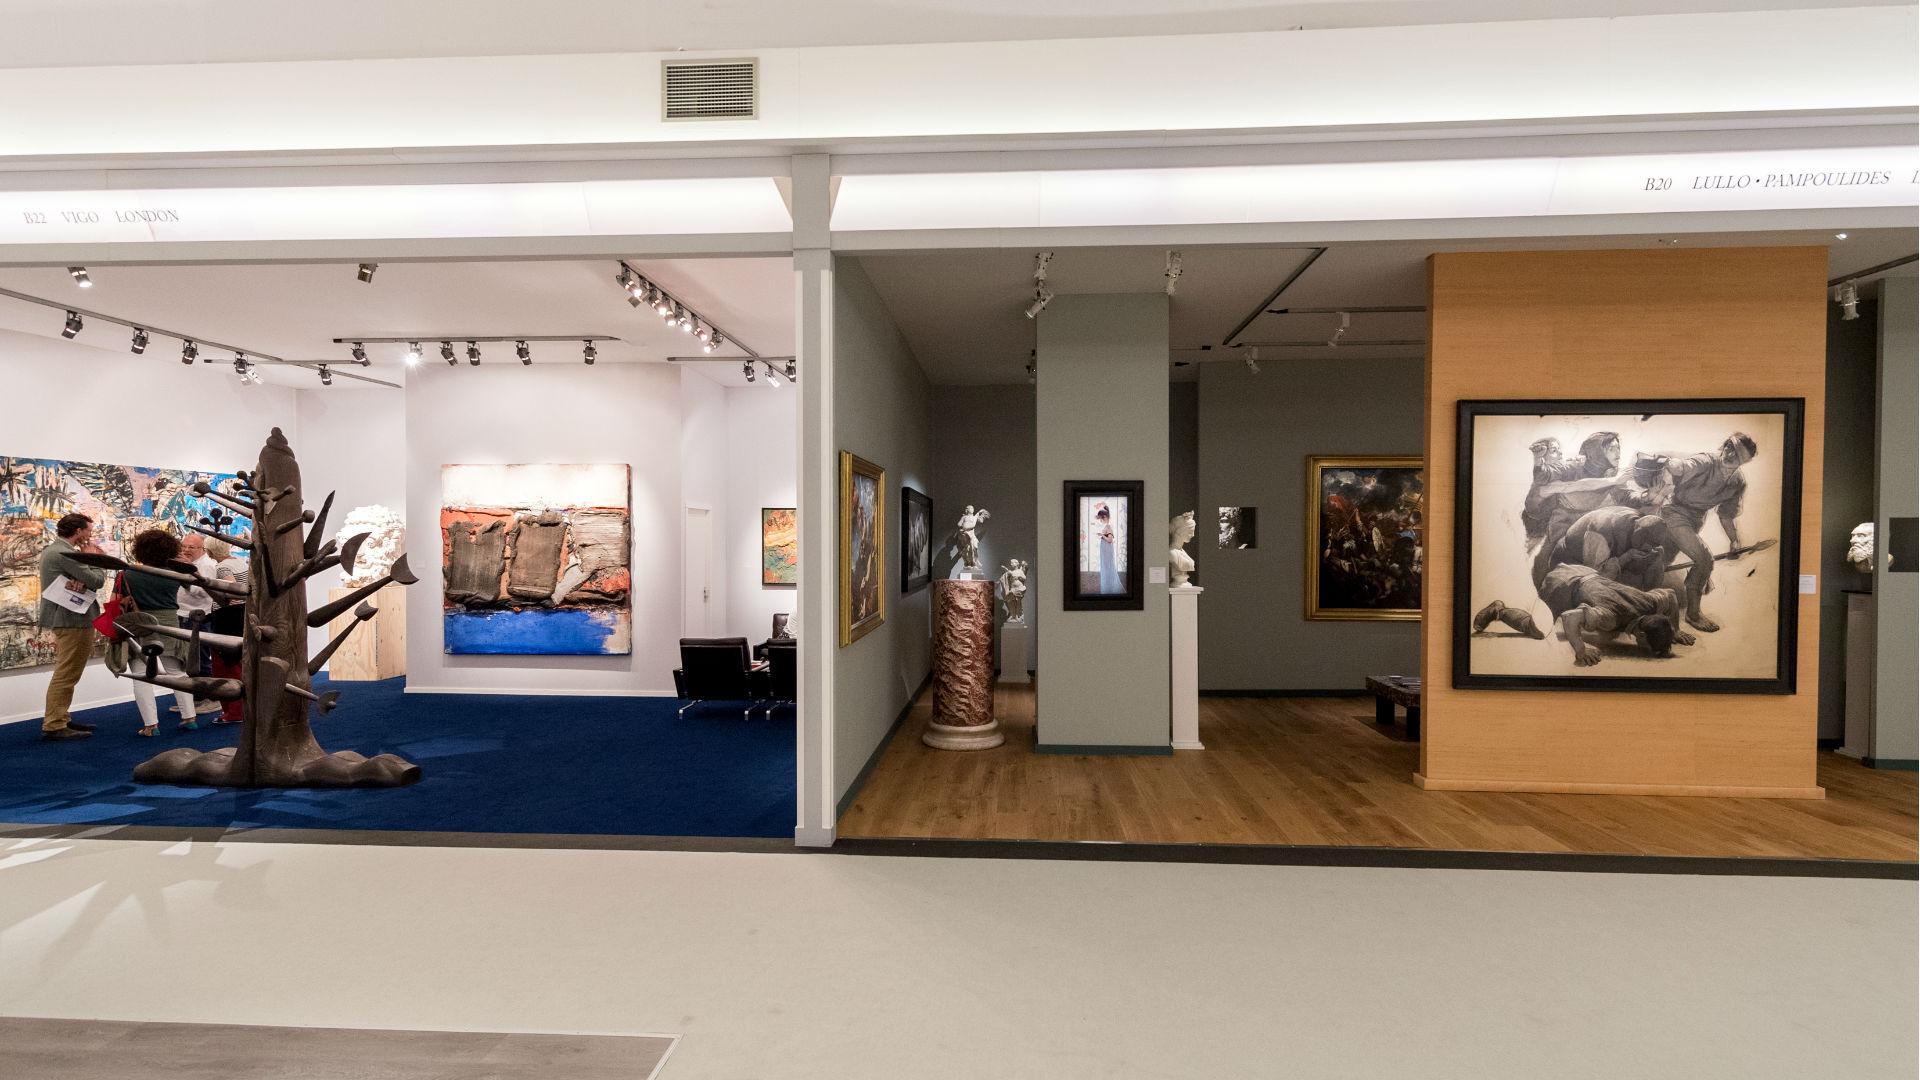 Vigo Gallery and Lullo Pompoulides at Masterpiece London 2018